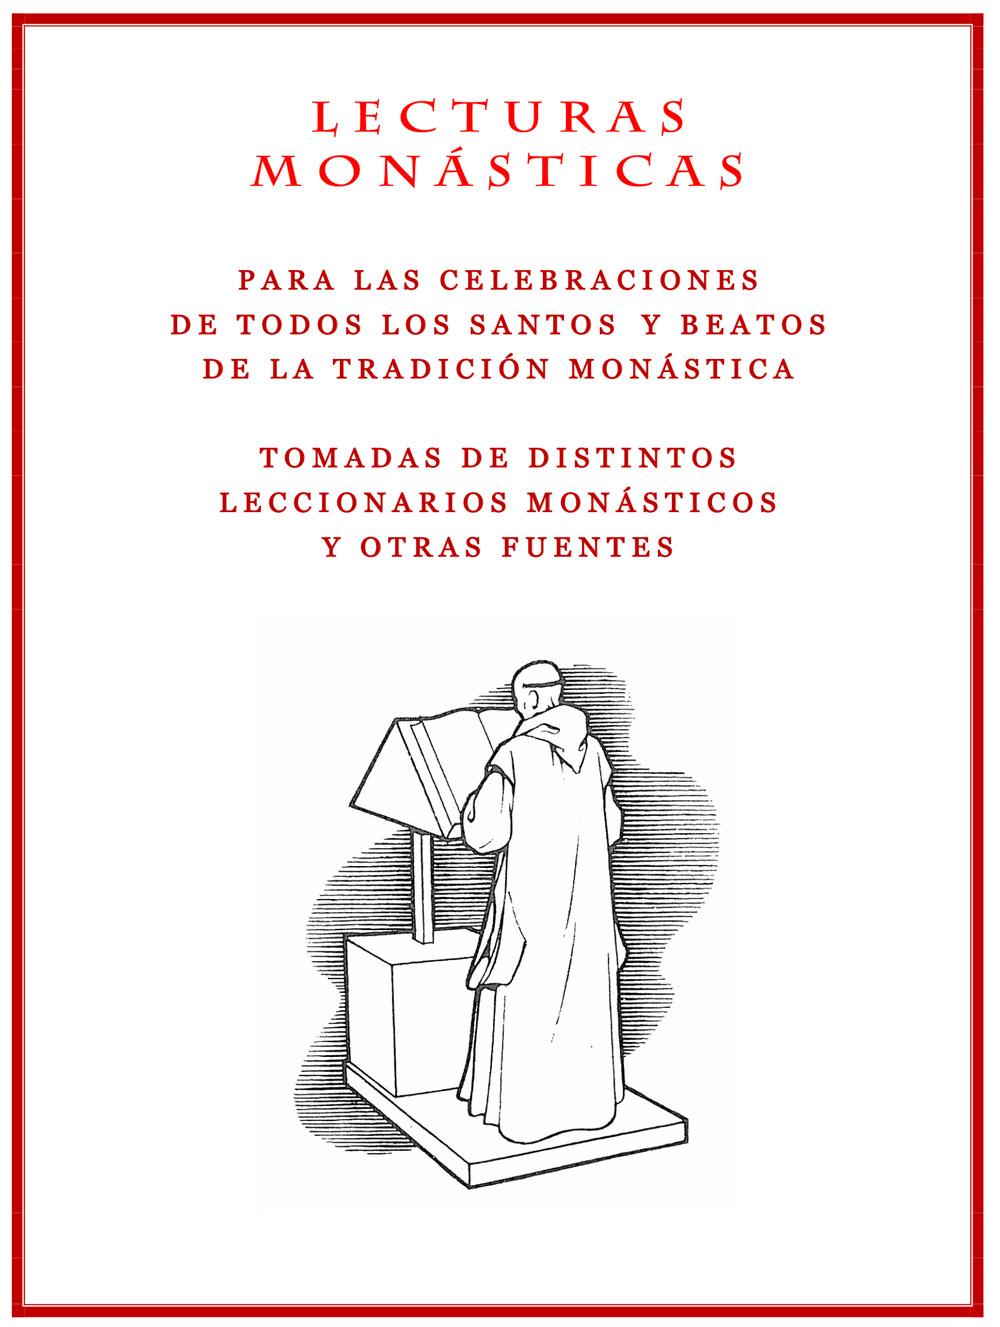 Lecturas monásticas